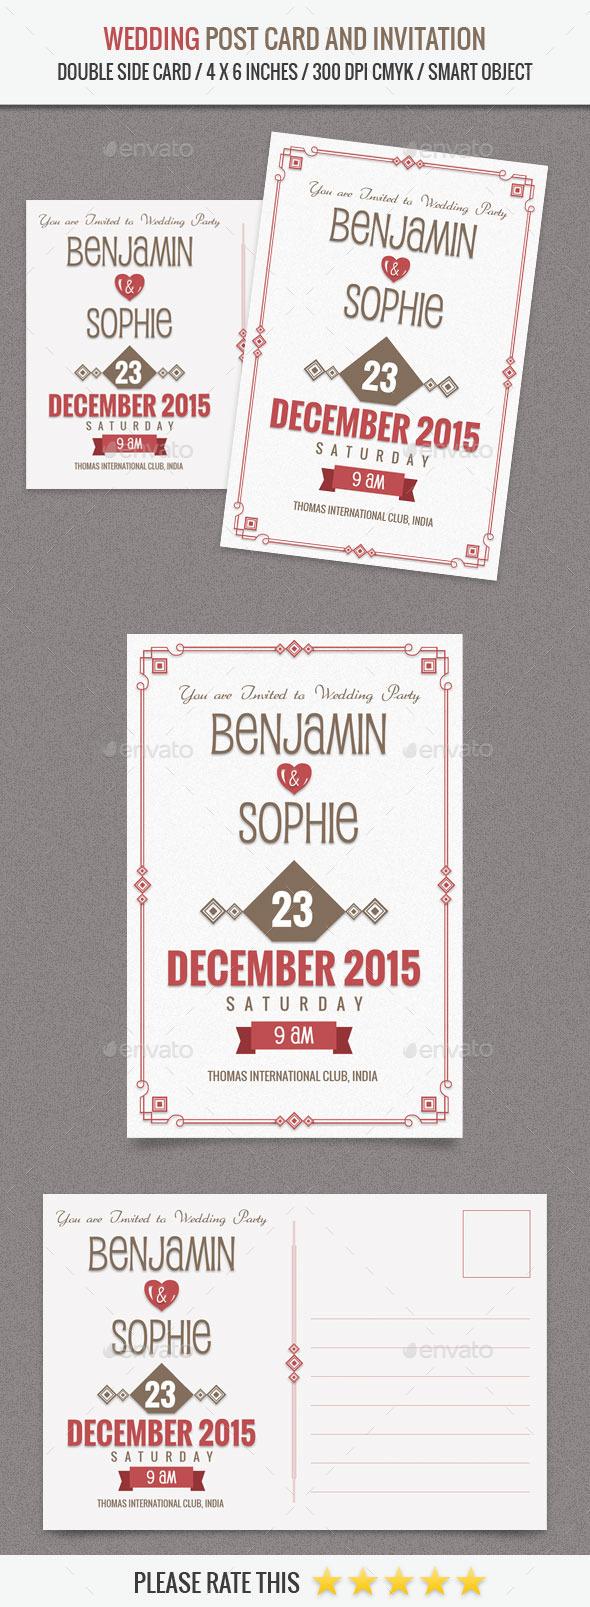 Wedding Invitation Post Card Template - Weddings Cards & Invites